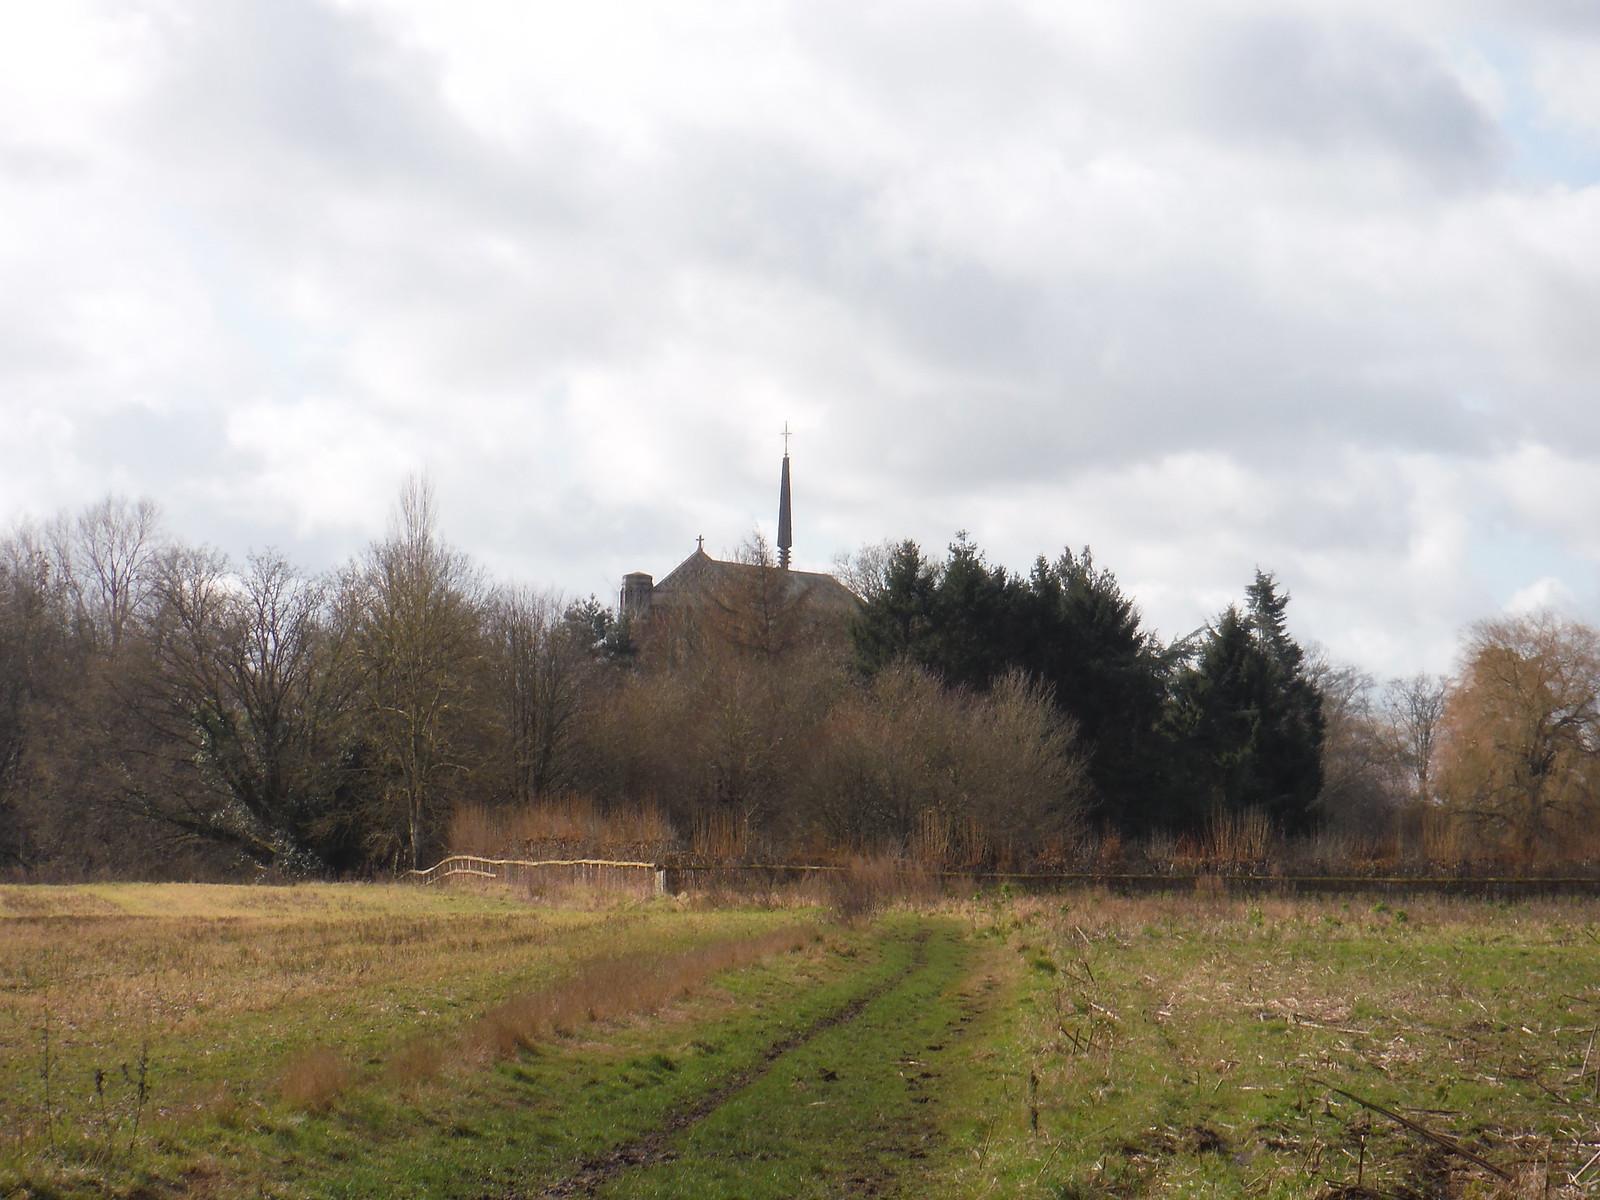 Douai Abbey from afar SWC Walk 117 Aldermaston to Woolhampton (via Stanford Dingley)